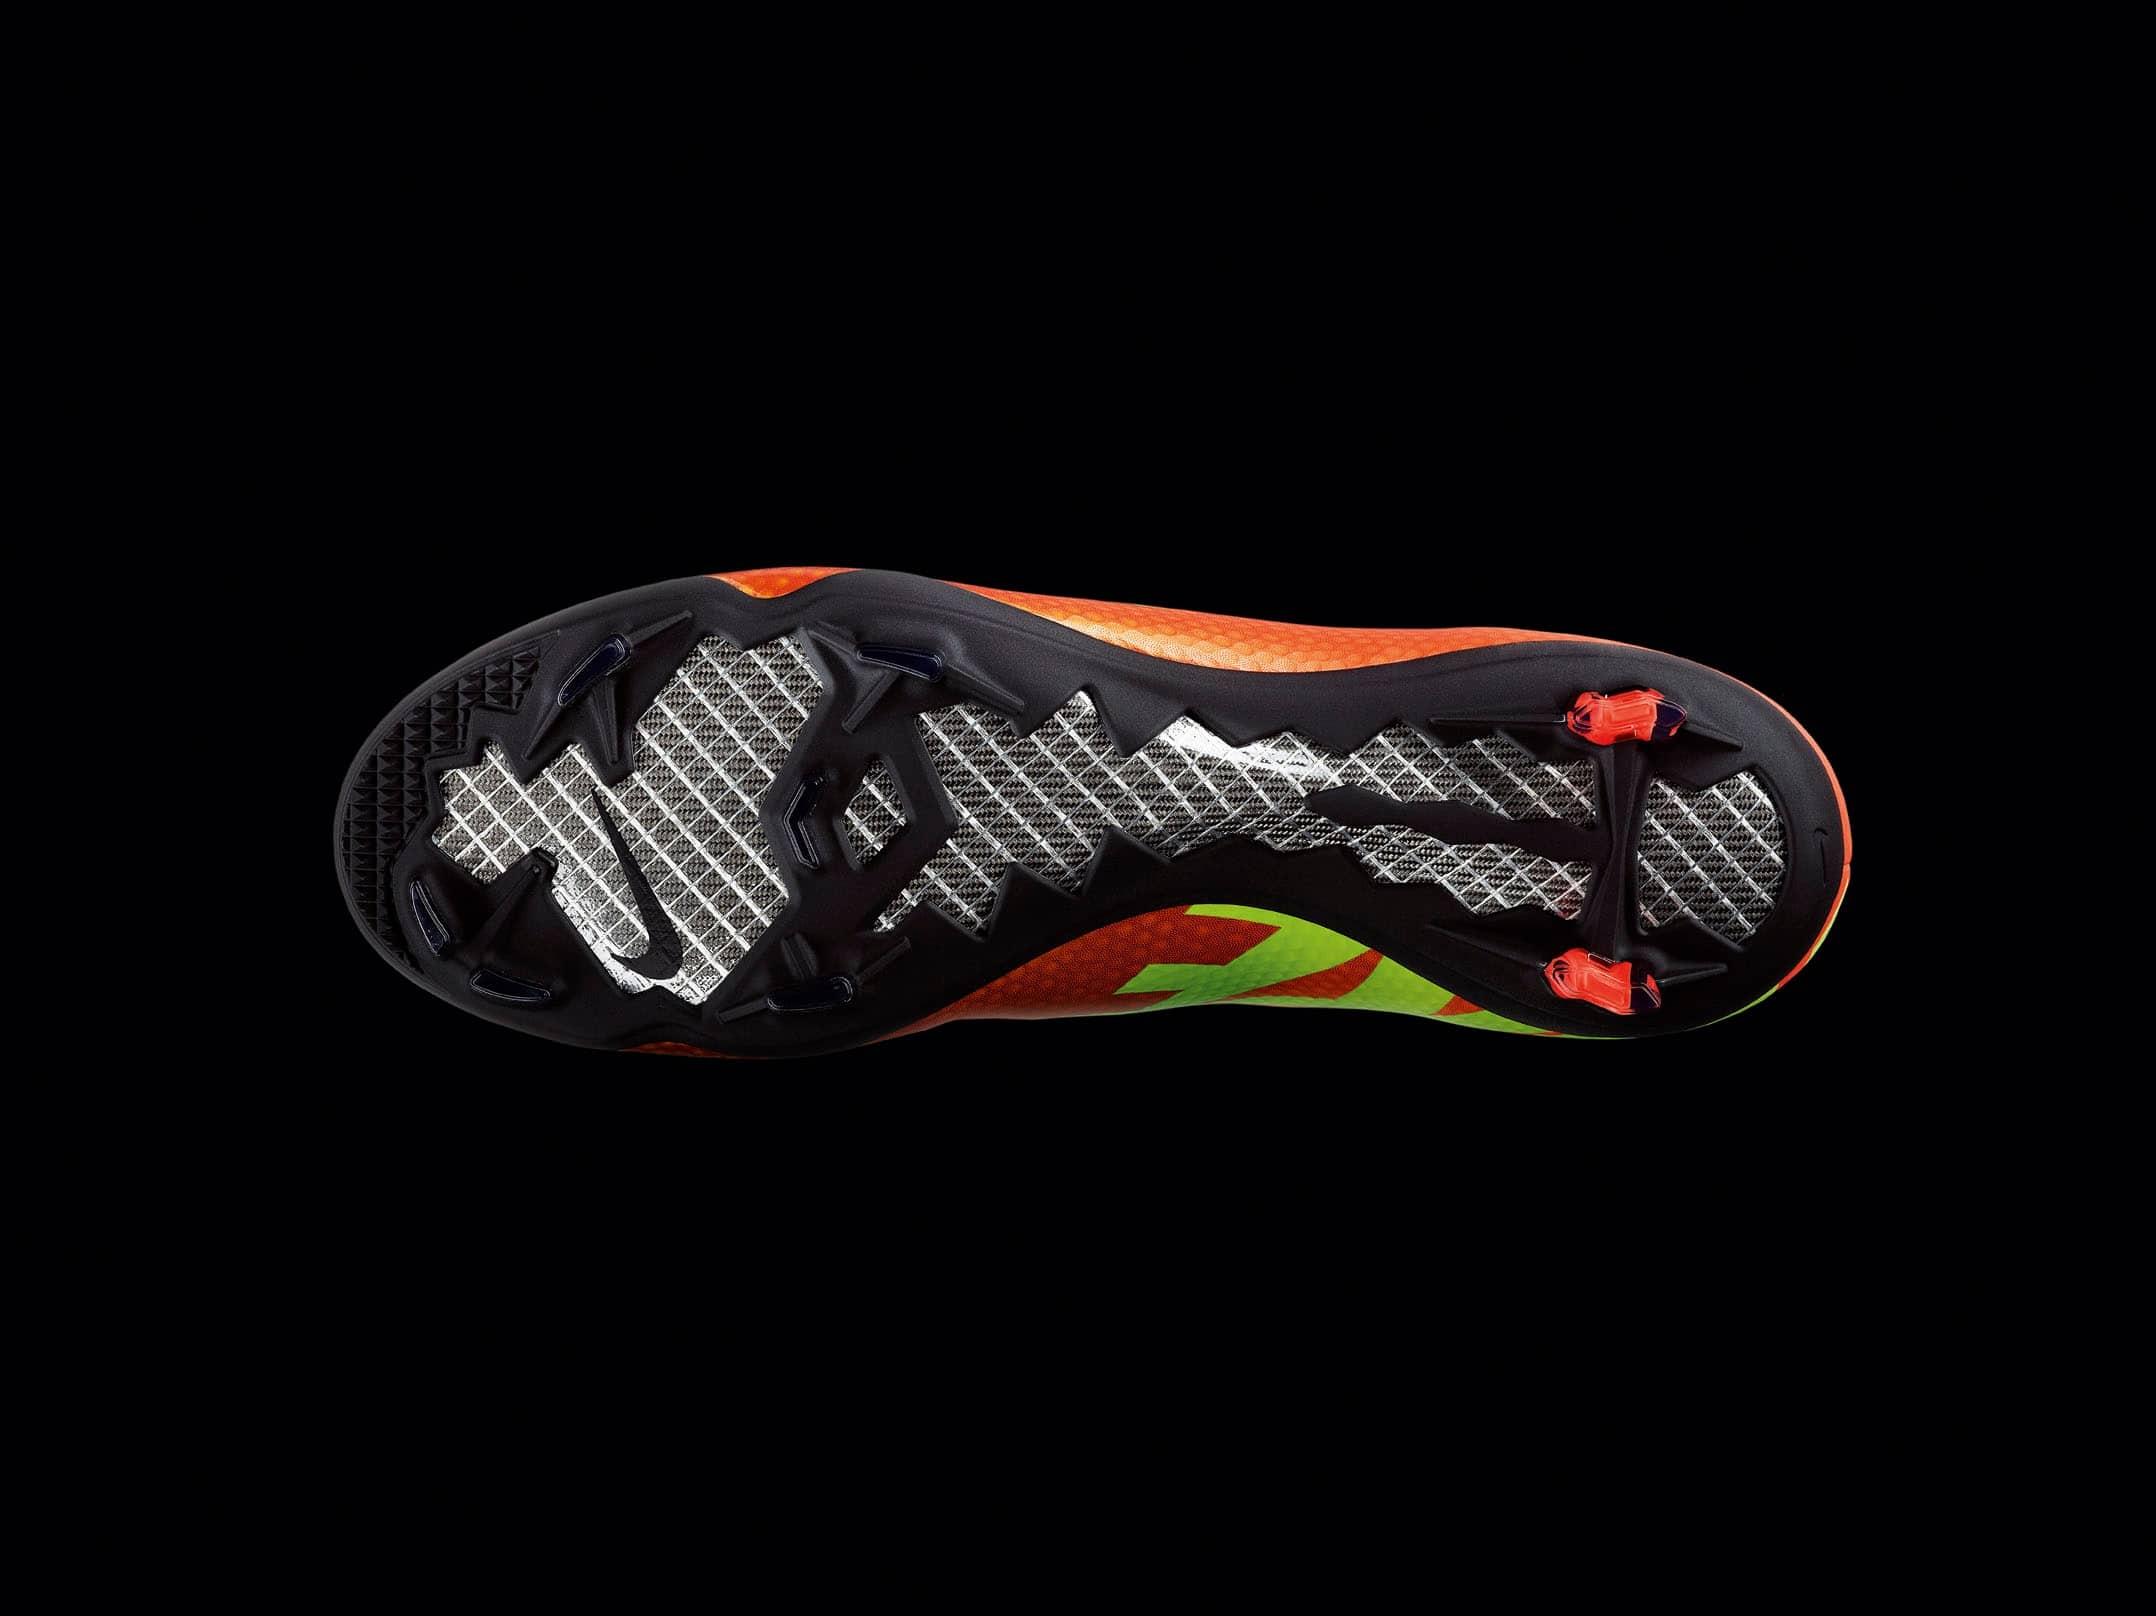 Nike Mercurial Vapor IX: Explosive Geschwindigkeit trifft Innovation